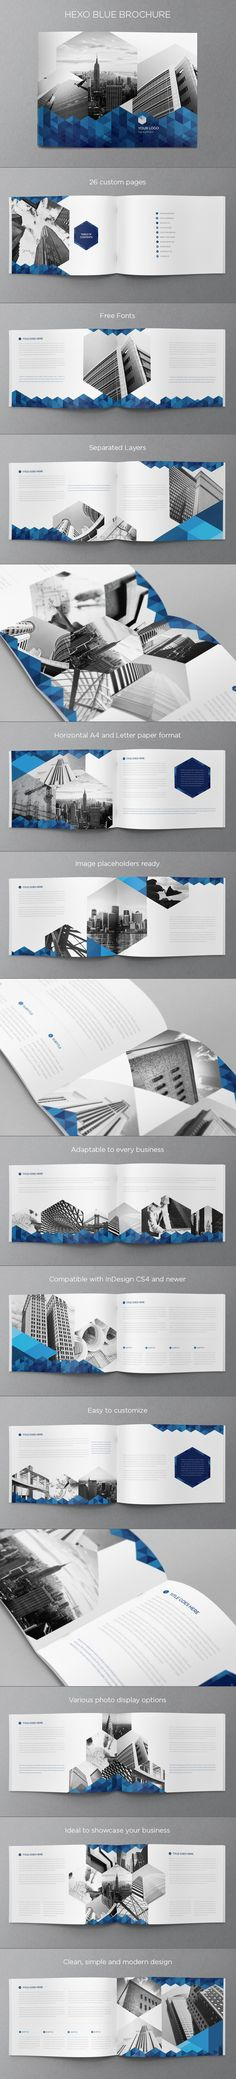 Real Estate Blue Hexo Brochure. Download here: http://graphicriver.net/item/real-estate-blue-hexo-brochure/6446056?ref=abradesign #design #brochure